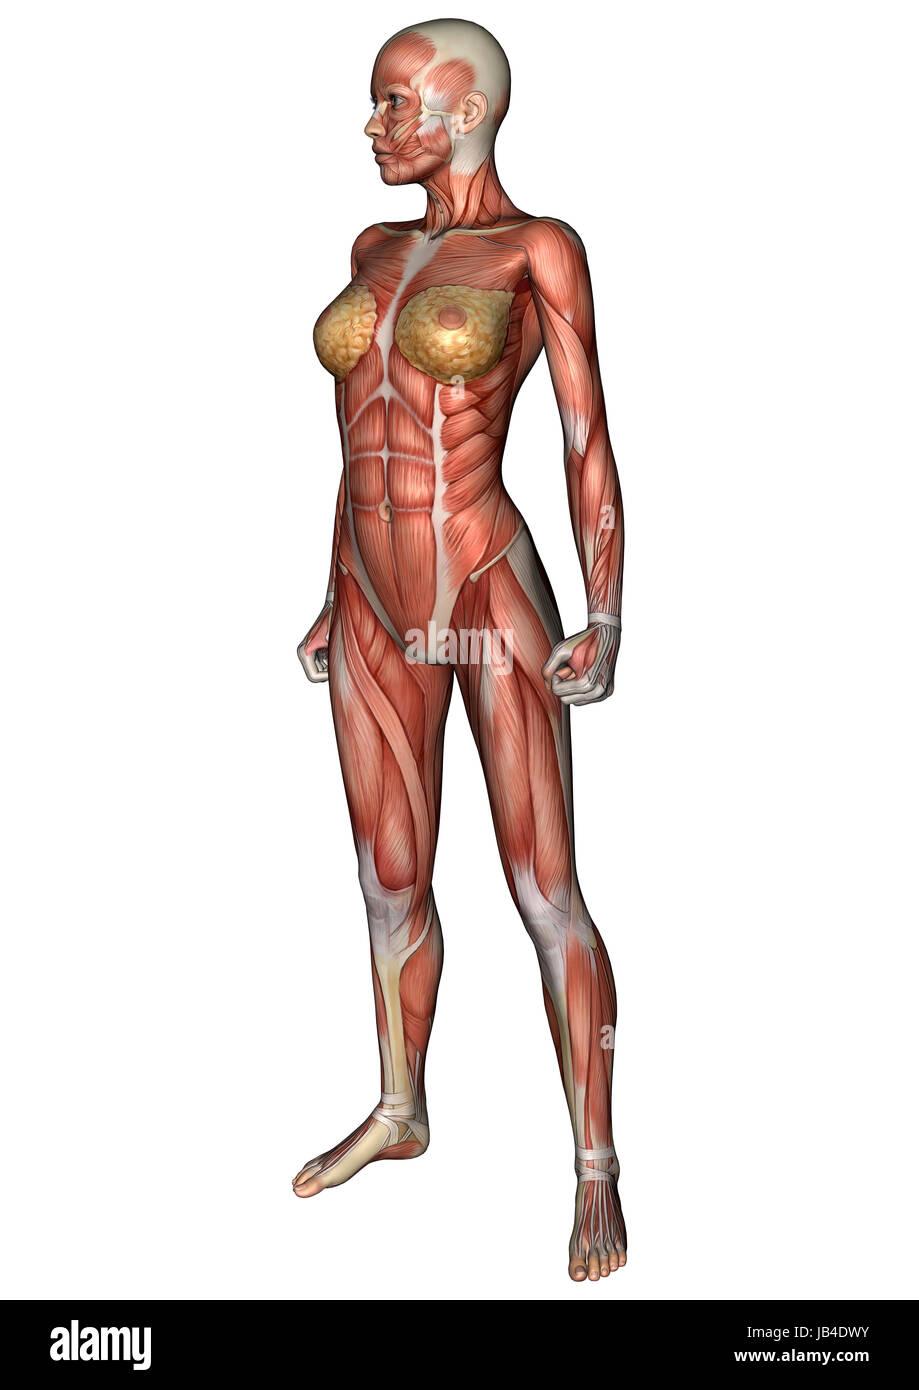 Charmant Muskeltraining Anatomie Bilder - Anatomie Ideen - finotti.info